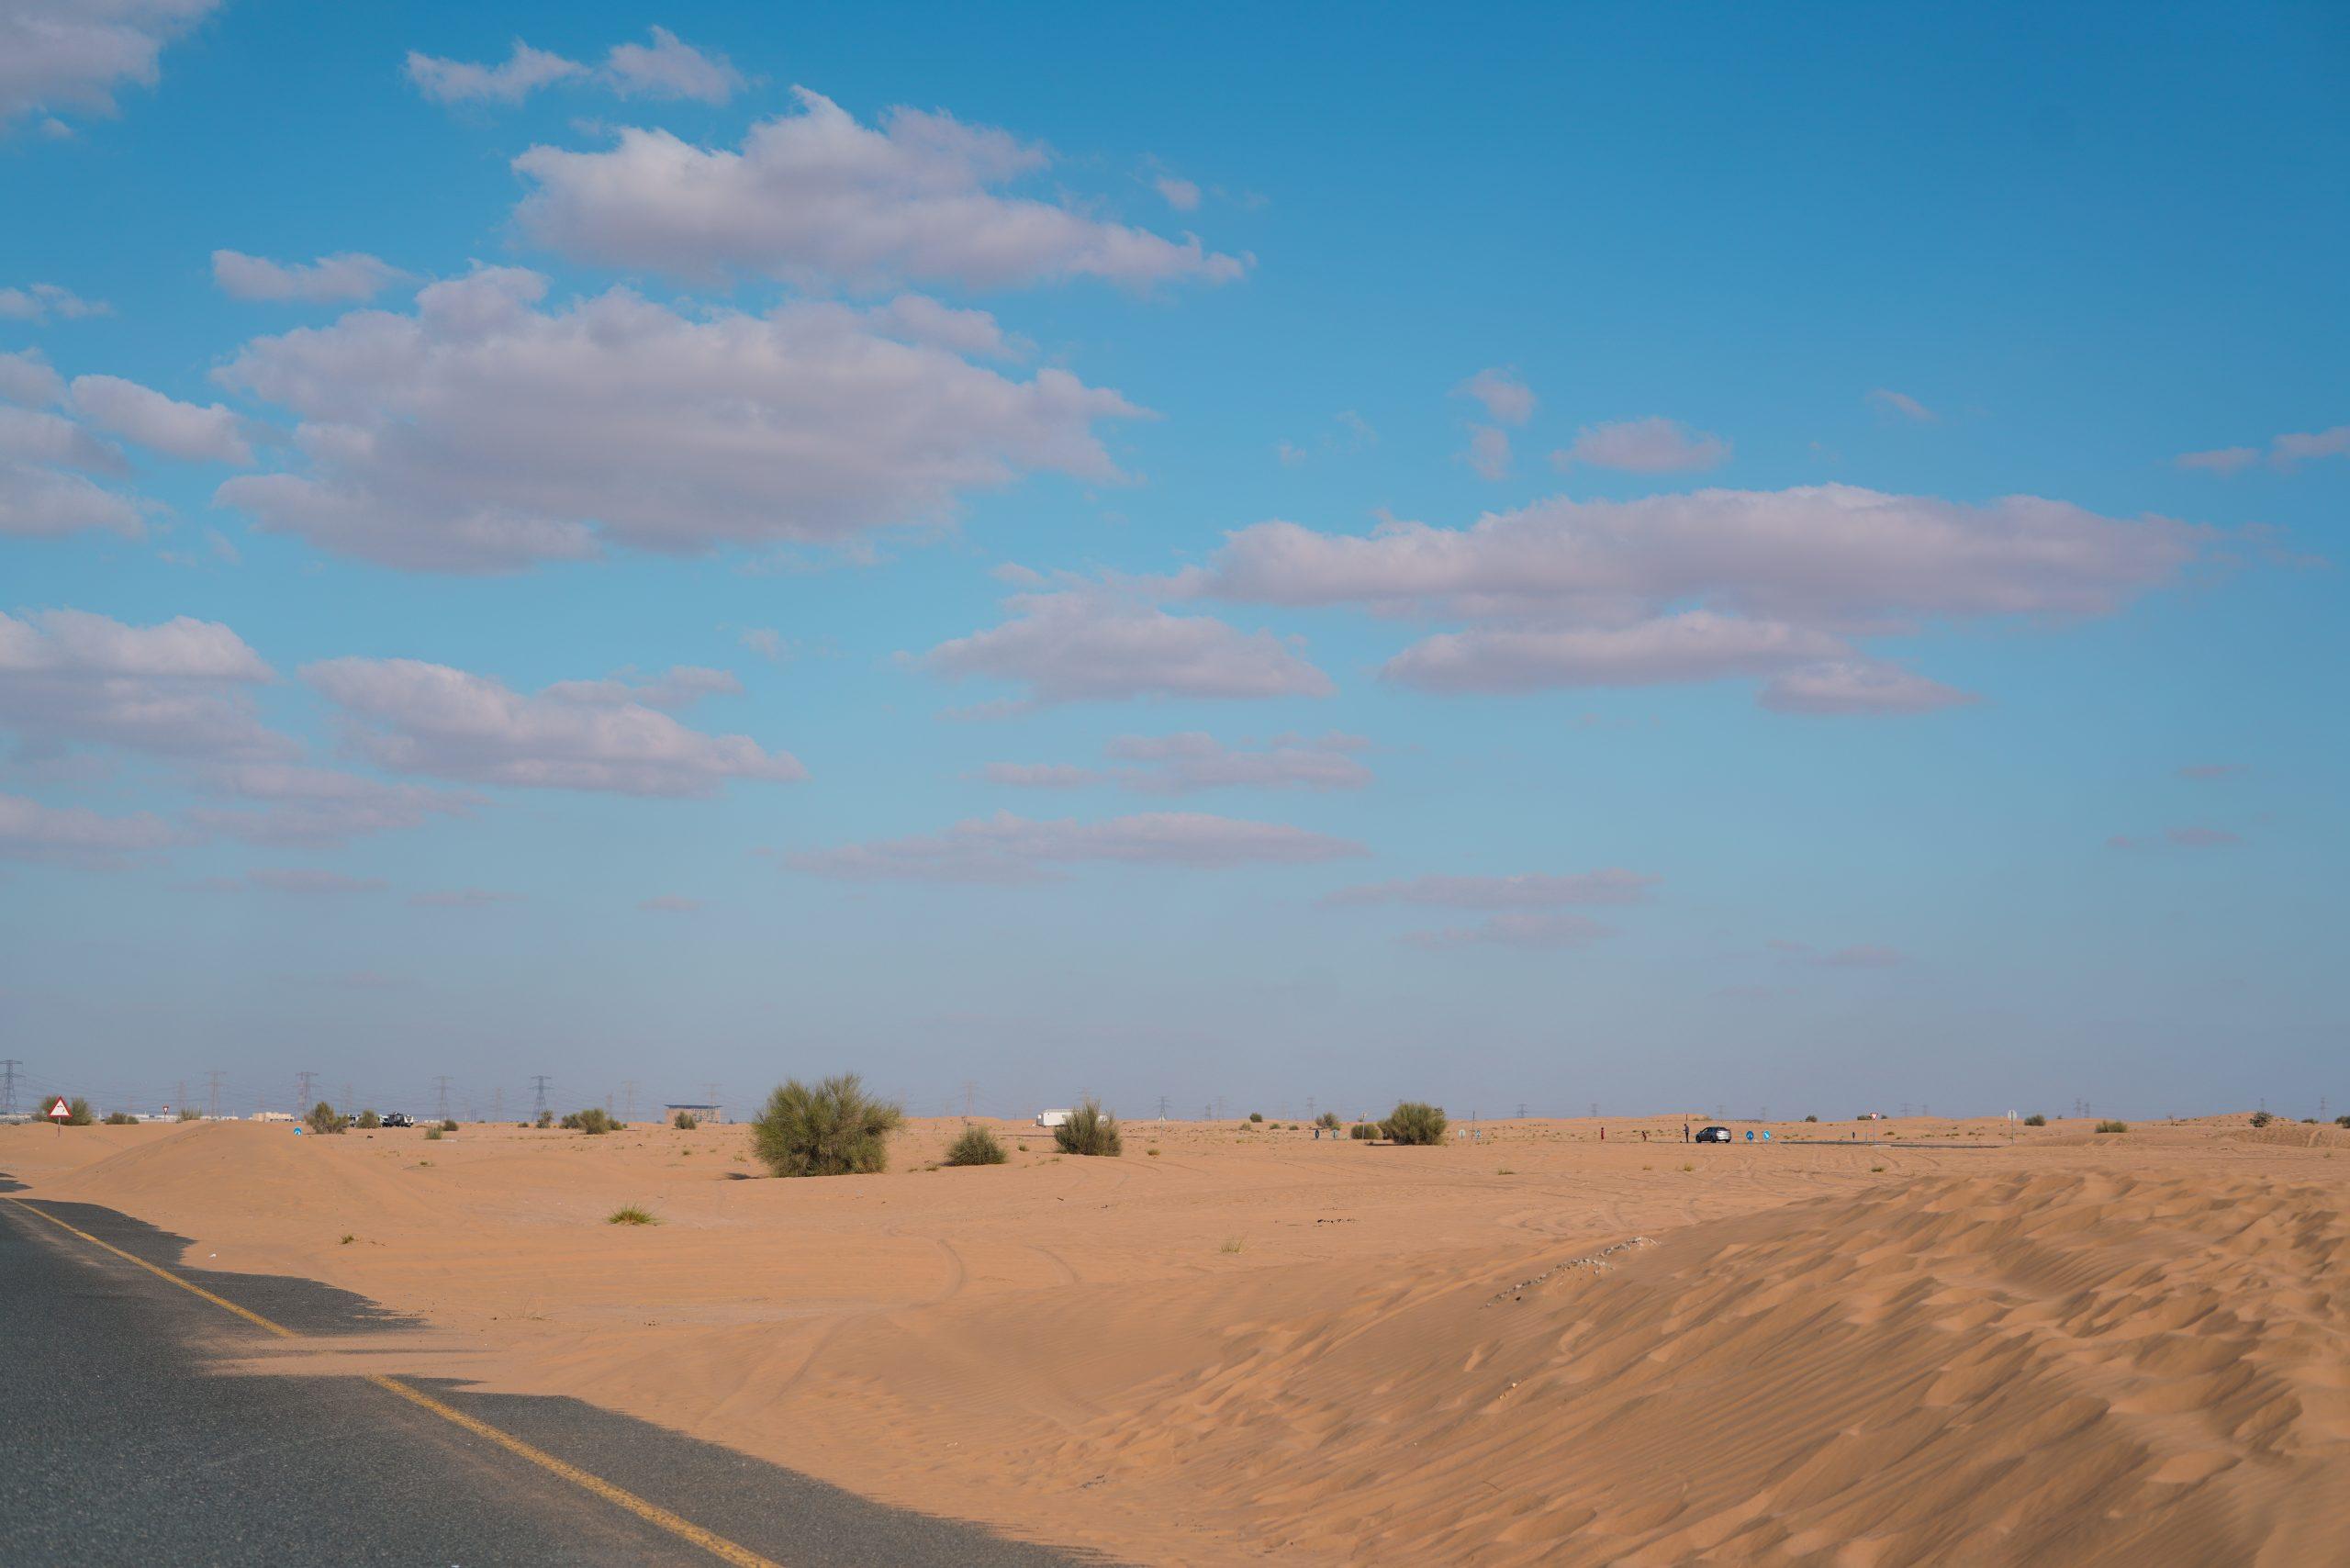 Desert beside a road